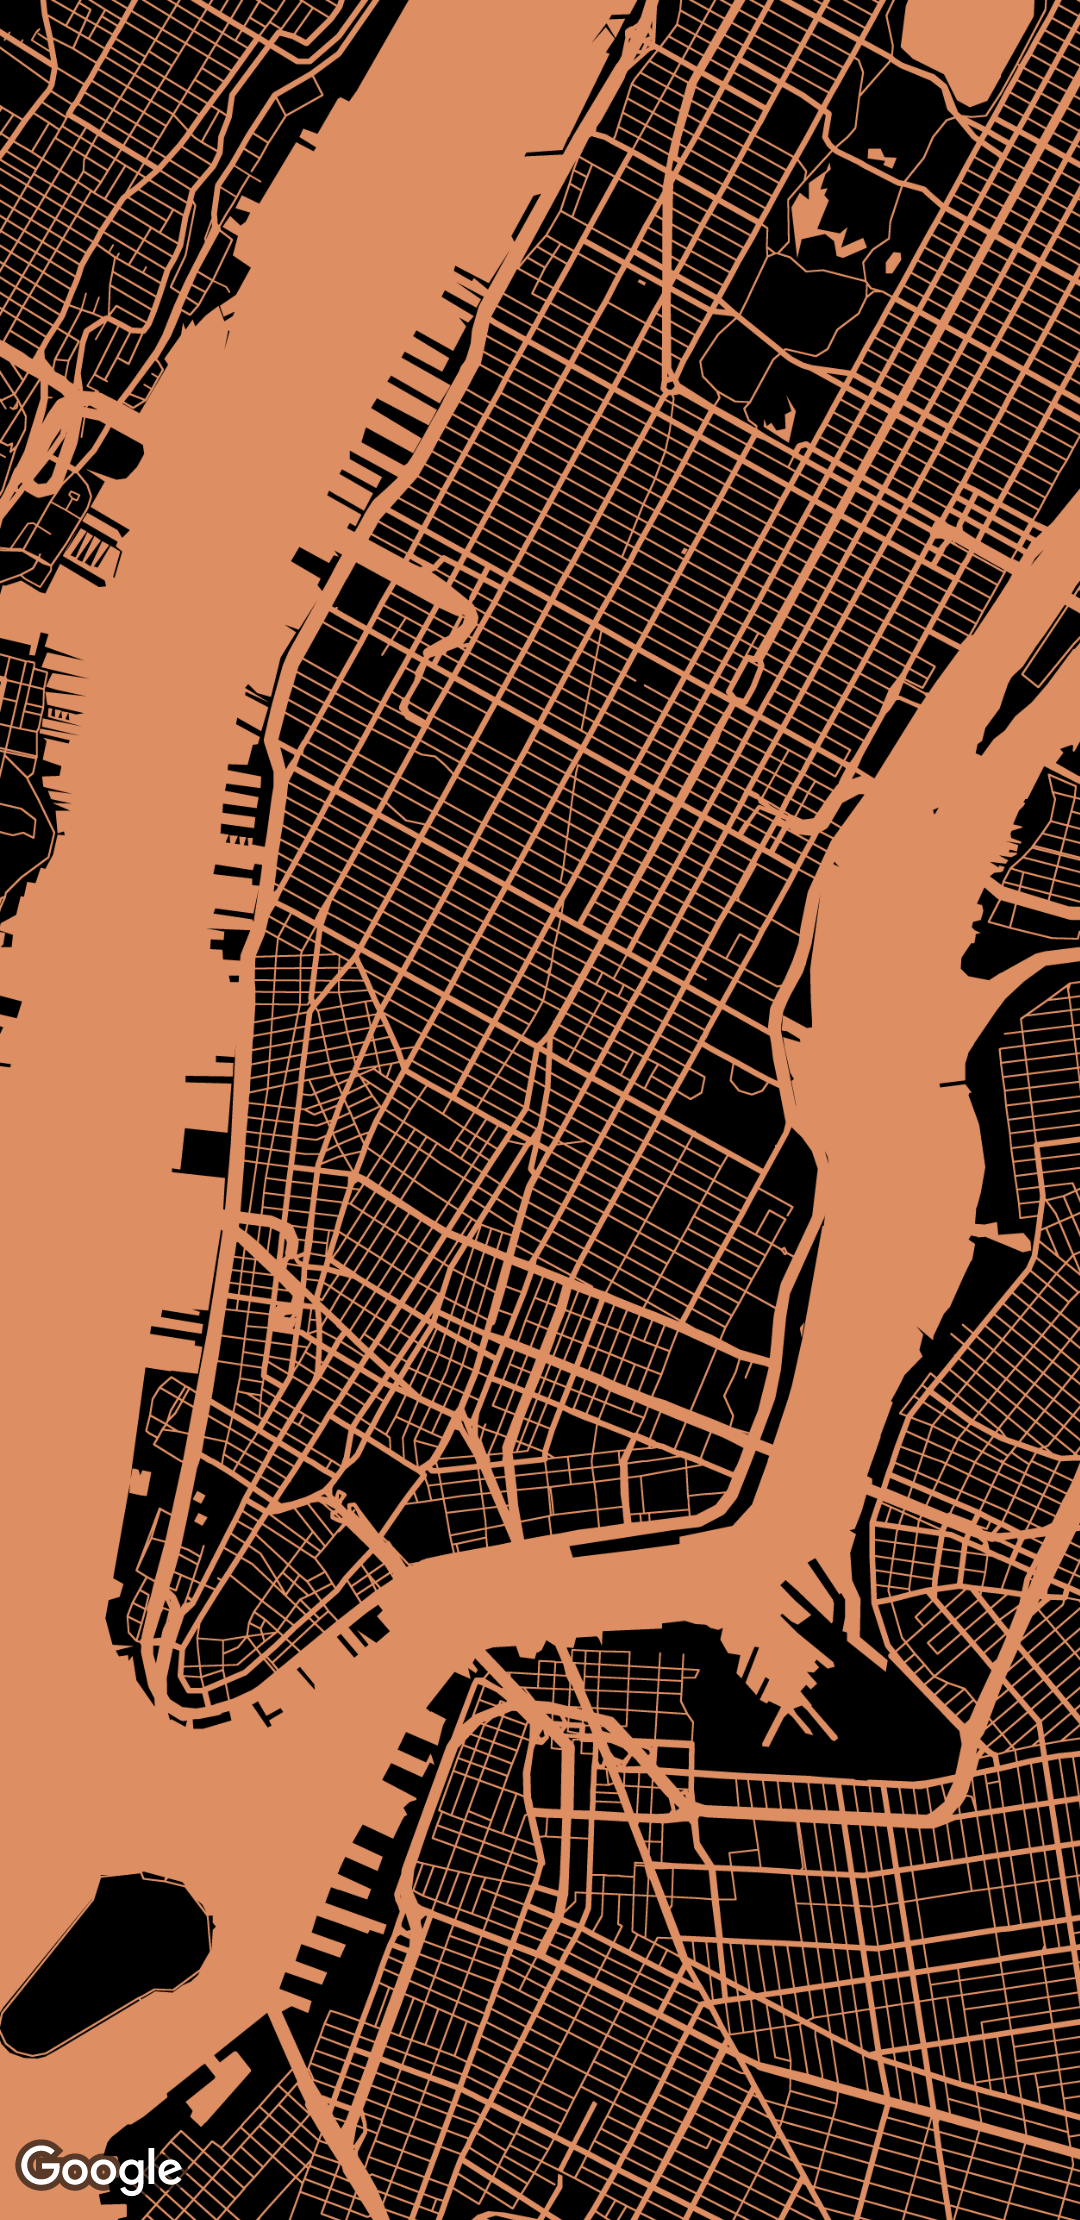 Vintage New York Map Wallpaper Http Www Worldstores Co Uk P Digetex Maps Vintage New York Map Wallpaper 180gsm Map Of New York New York City Map Street Map